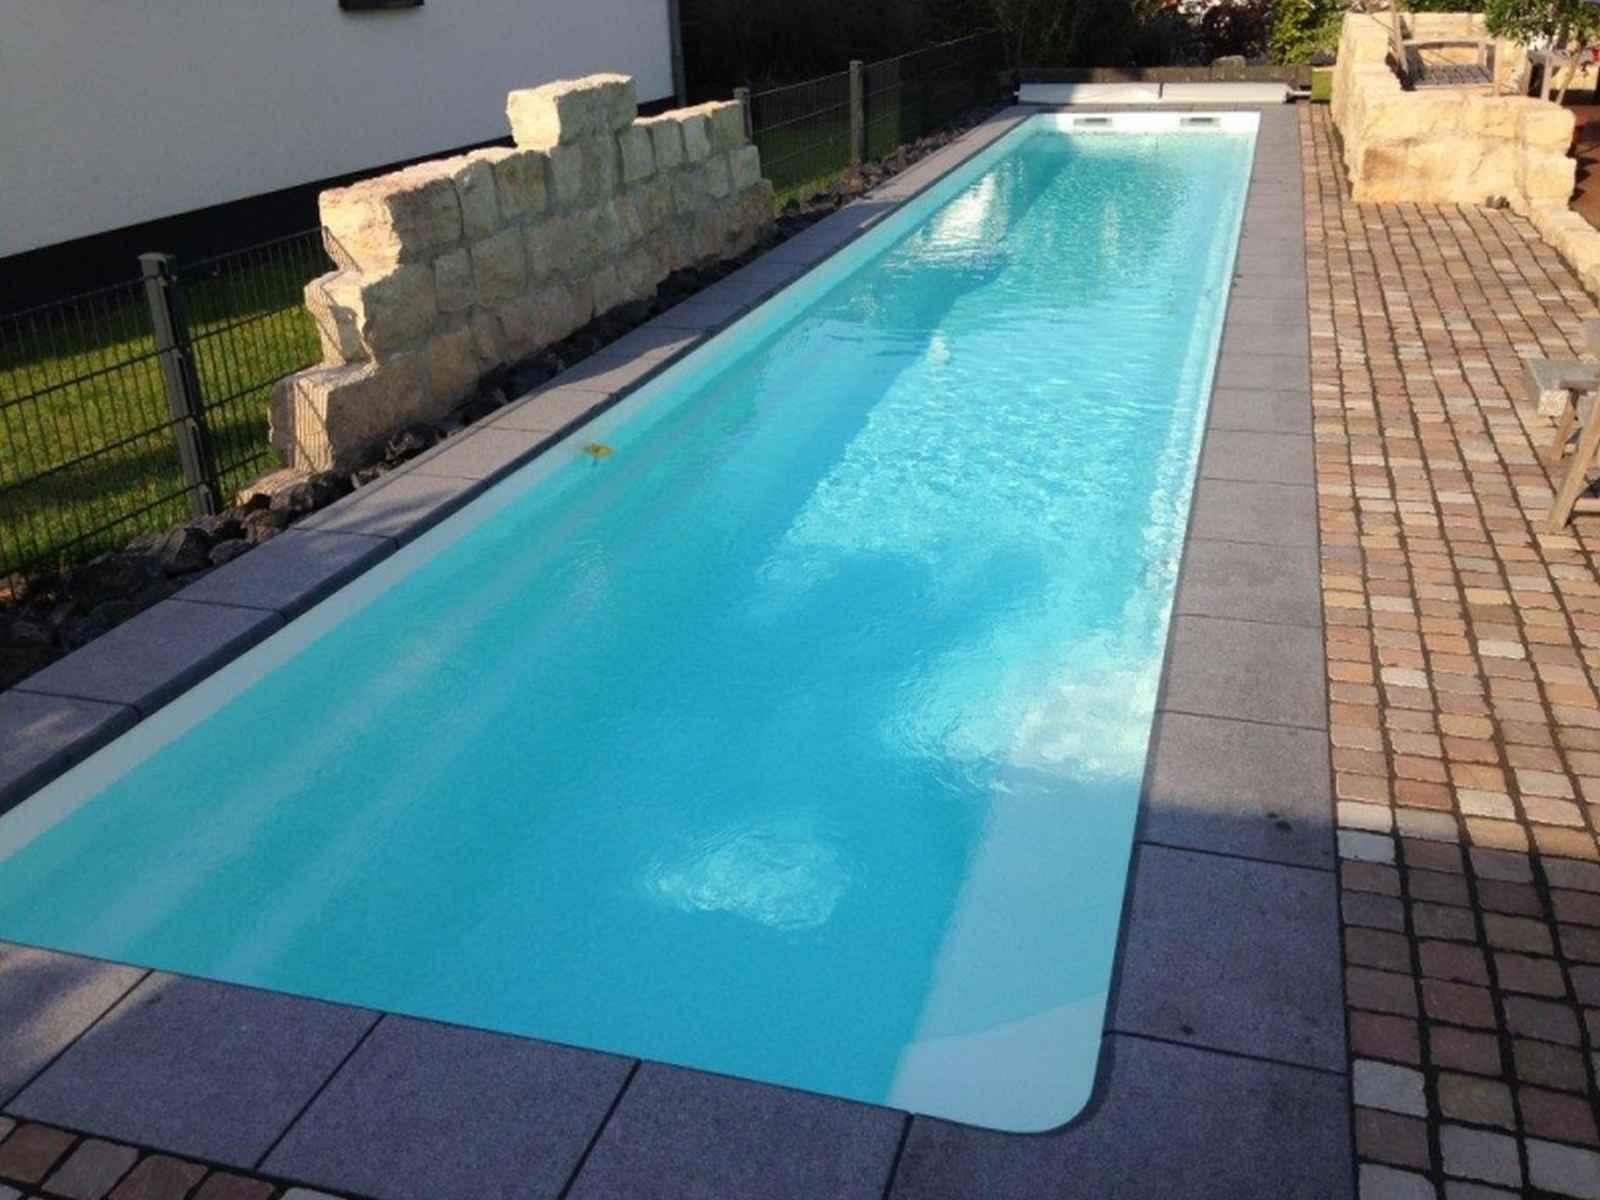 Mon de pra lane 12 schwimmbadtechnik frankfurt for Piscine mon de pra